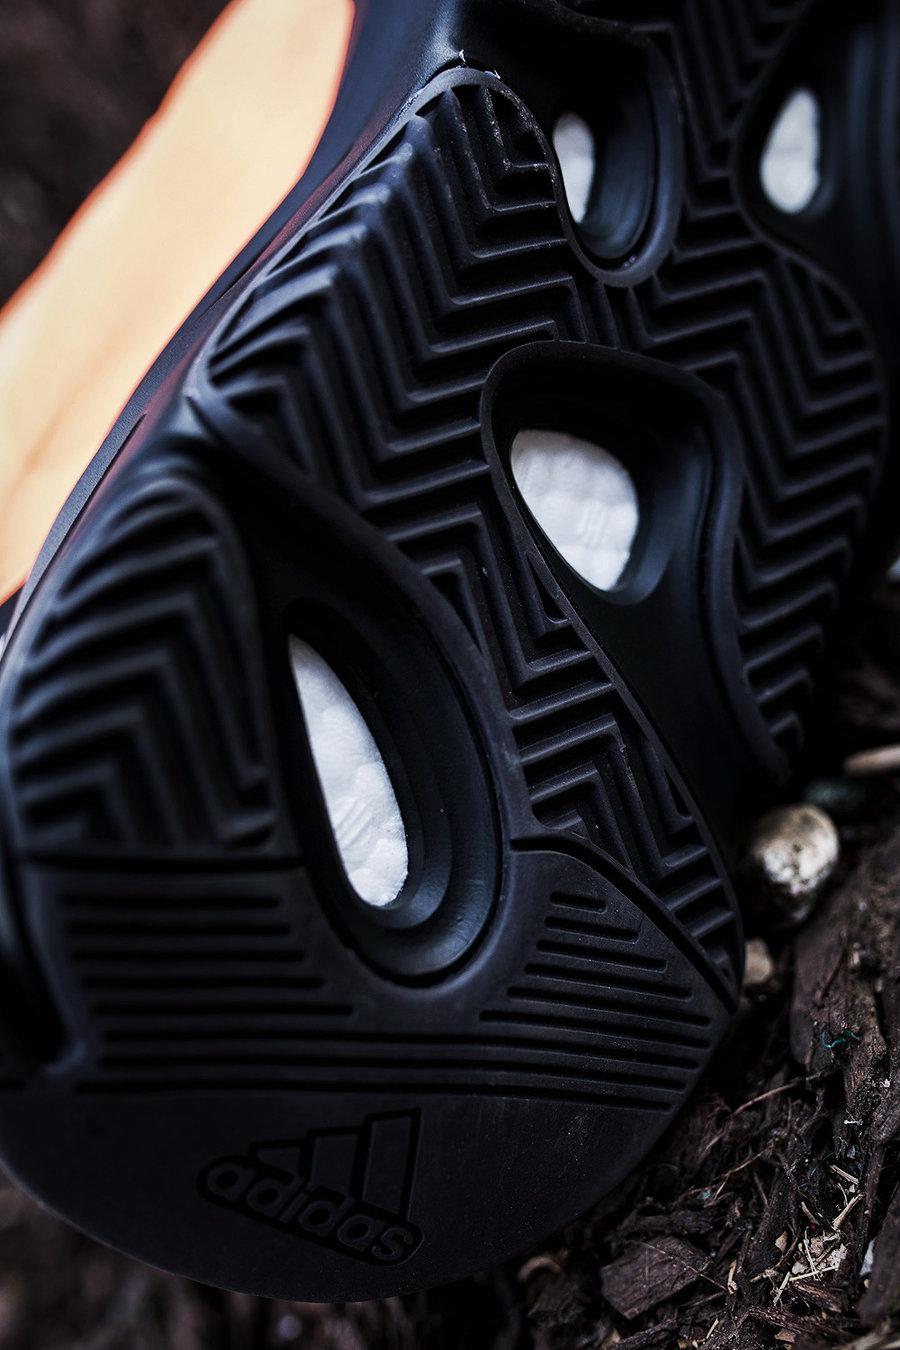 Yeezy 700 MNVN,adidas,发售,开箱,上脚  本月最难抢的 Yeezy 后天发售!看完小编上脚绝对真香!